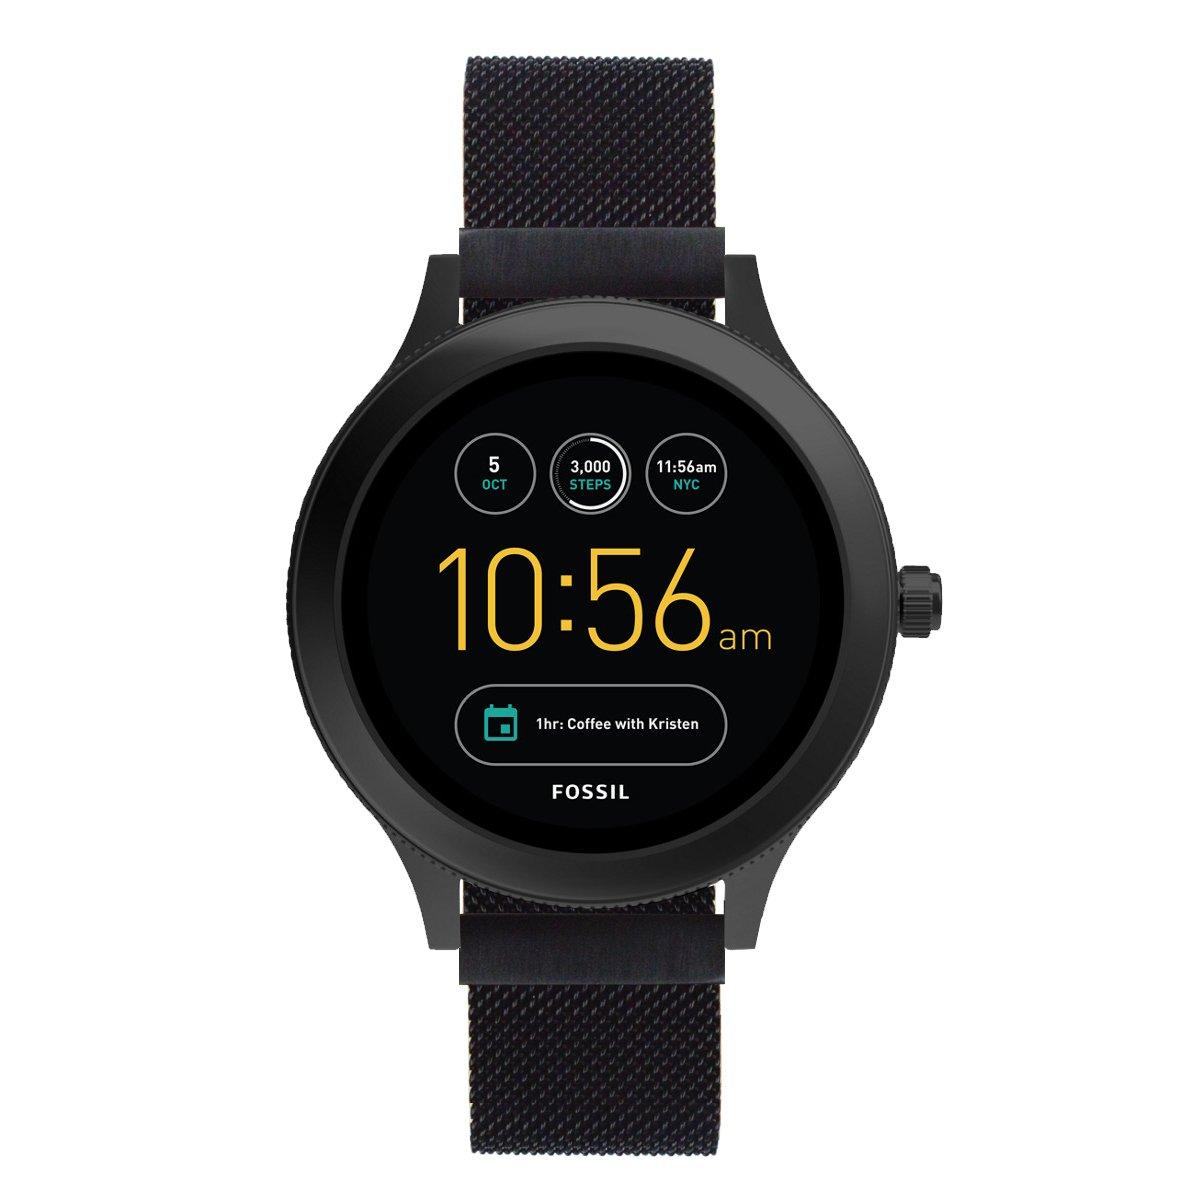 Kartice Compatible with Fossil Venture HR Gen 4 Bands Womens Gen 4 Sport 18mm Replacement Strap for Fossil Gen 3 Q Venture Smartwatch (Black)